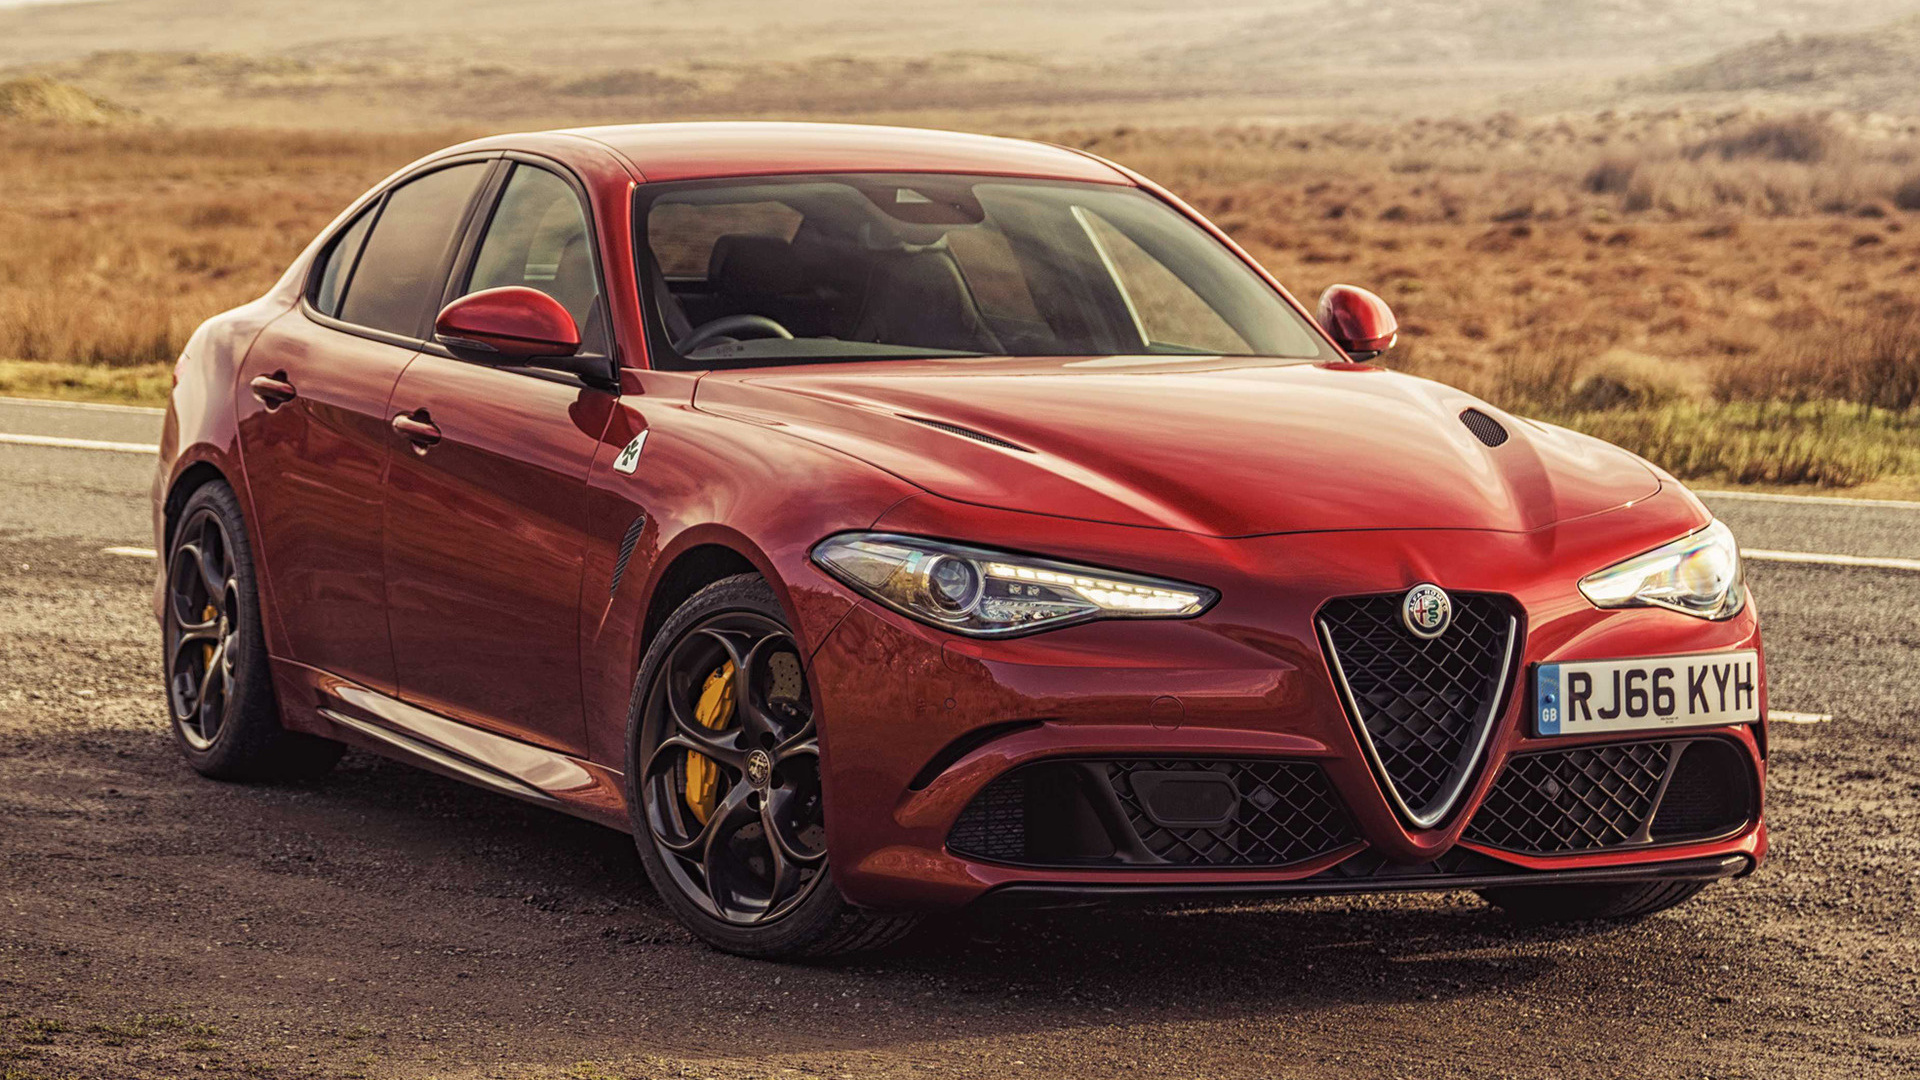 Alfa Romeo Giulia Quadrifoglio (2016) UK Wallpapers and HD ...